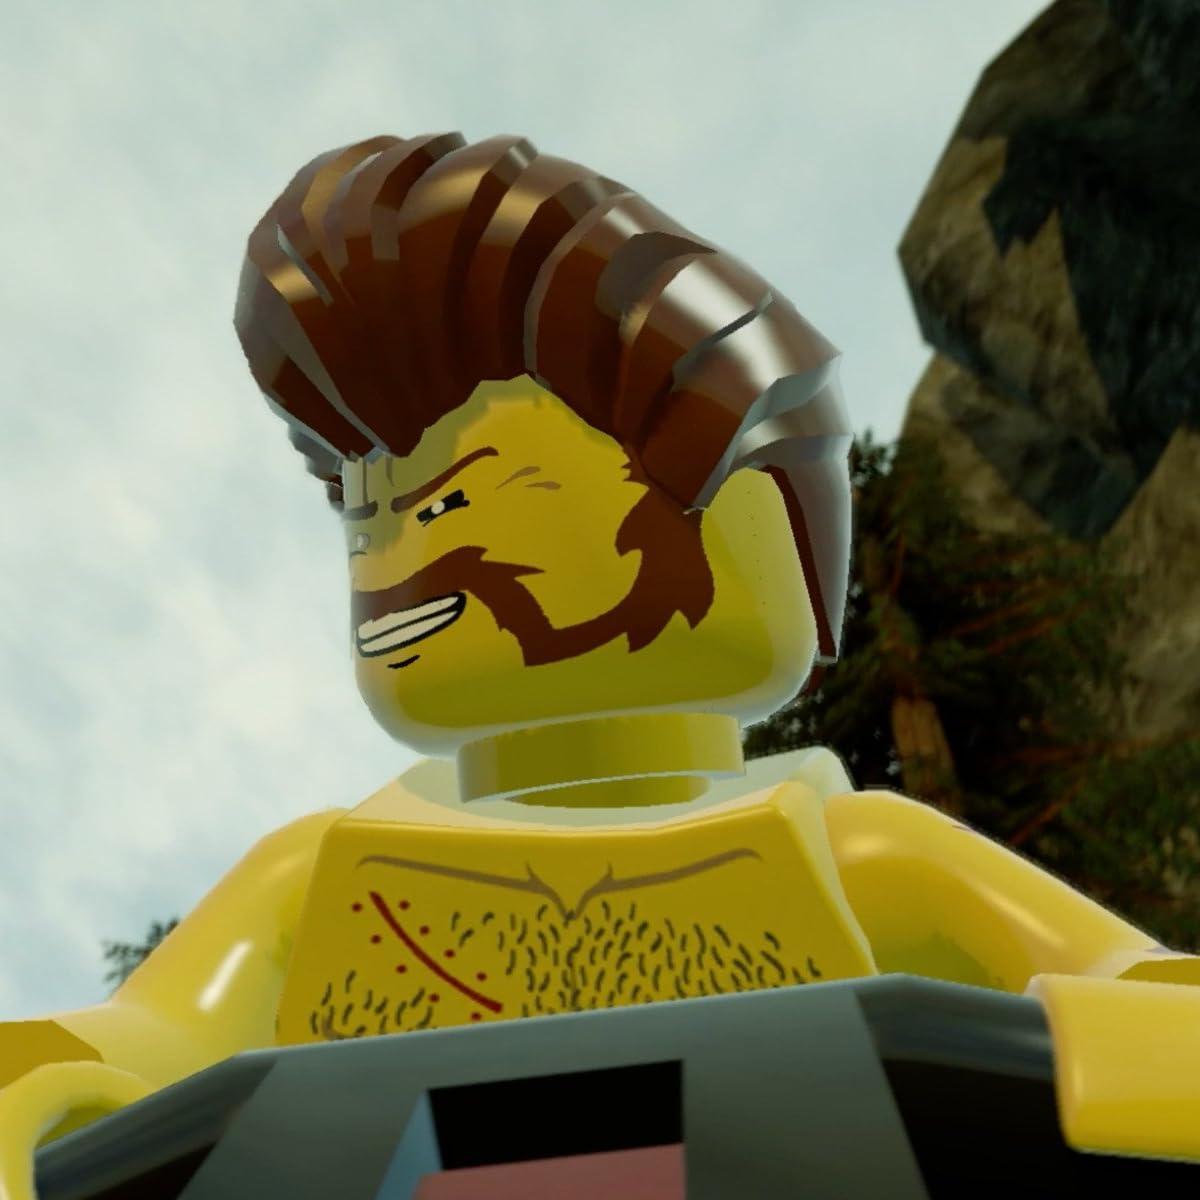 Lego レゴ Ipad壁紙 Run In With Rex Fury その他 スマホ用画像138421